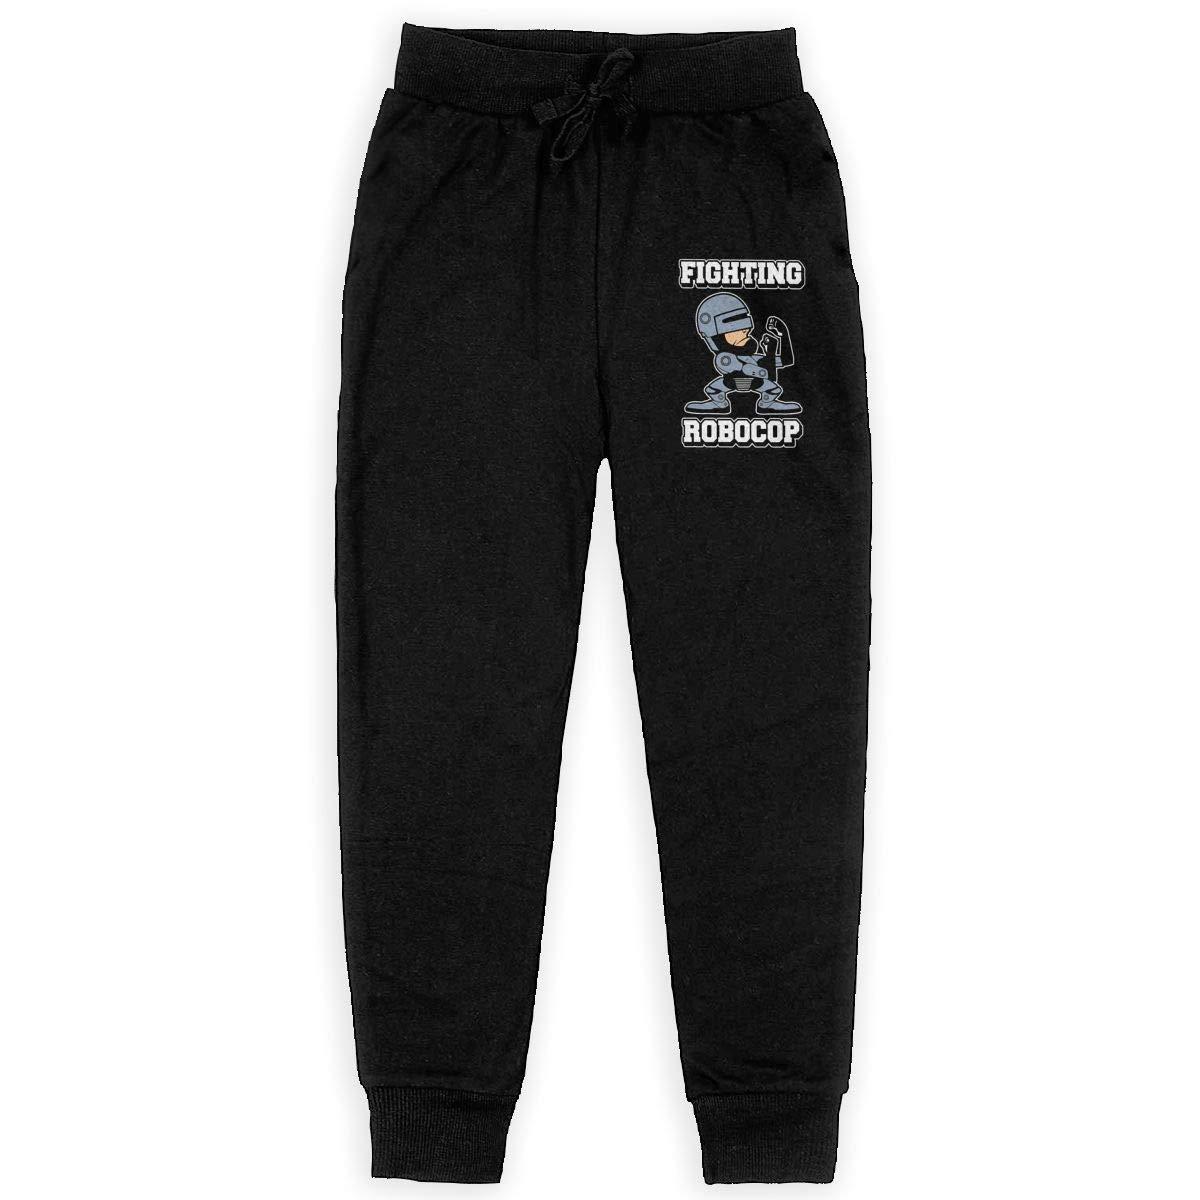 Kim Mittelstaedt Fighting Robocop Boys Big Active Basic Casual Pants Sweatpants for Boys Black